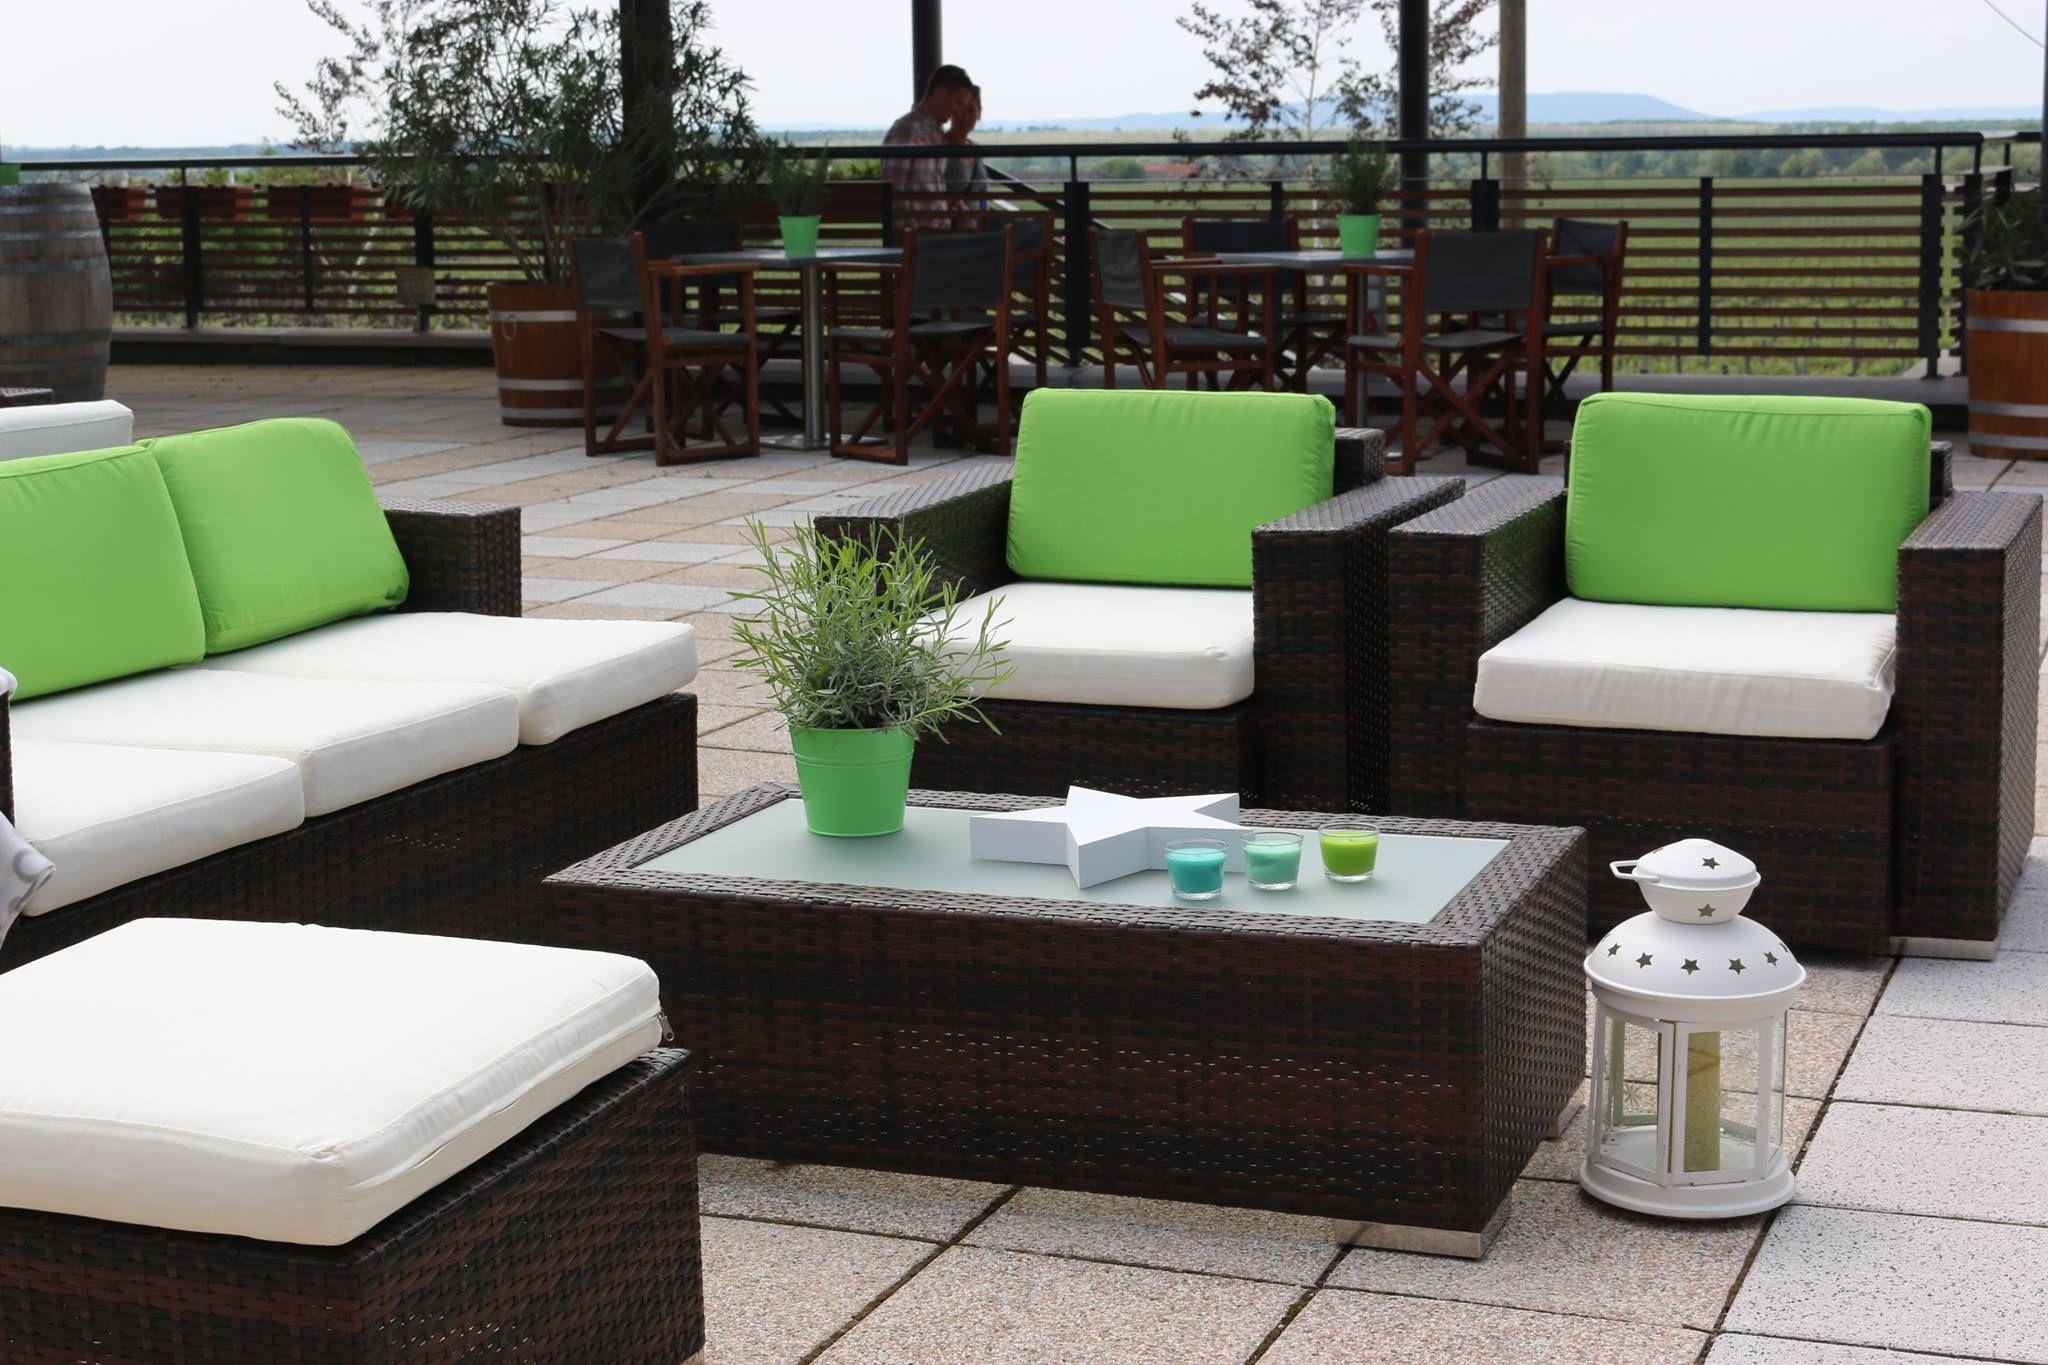 Tornai Pinceszet Gartenmoebel Auflagen Terrasse Grun Gartenmobel Gartenmobel Auflagen Gartenauflagen